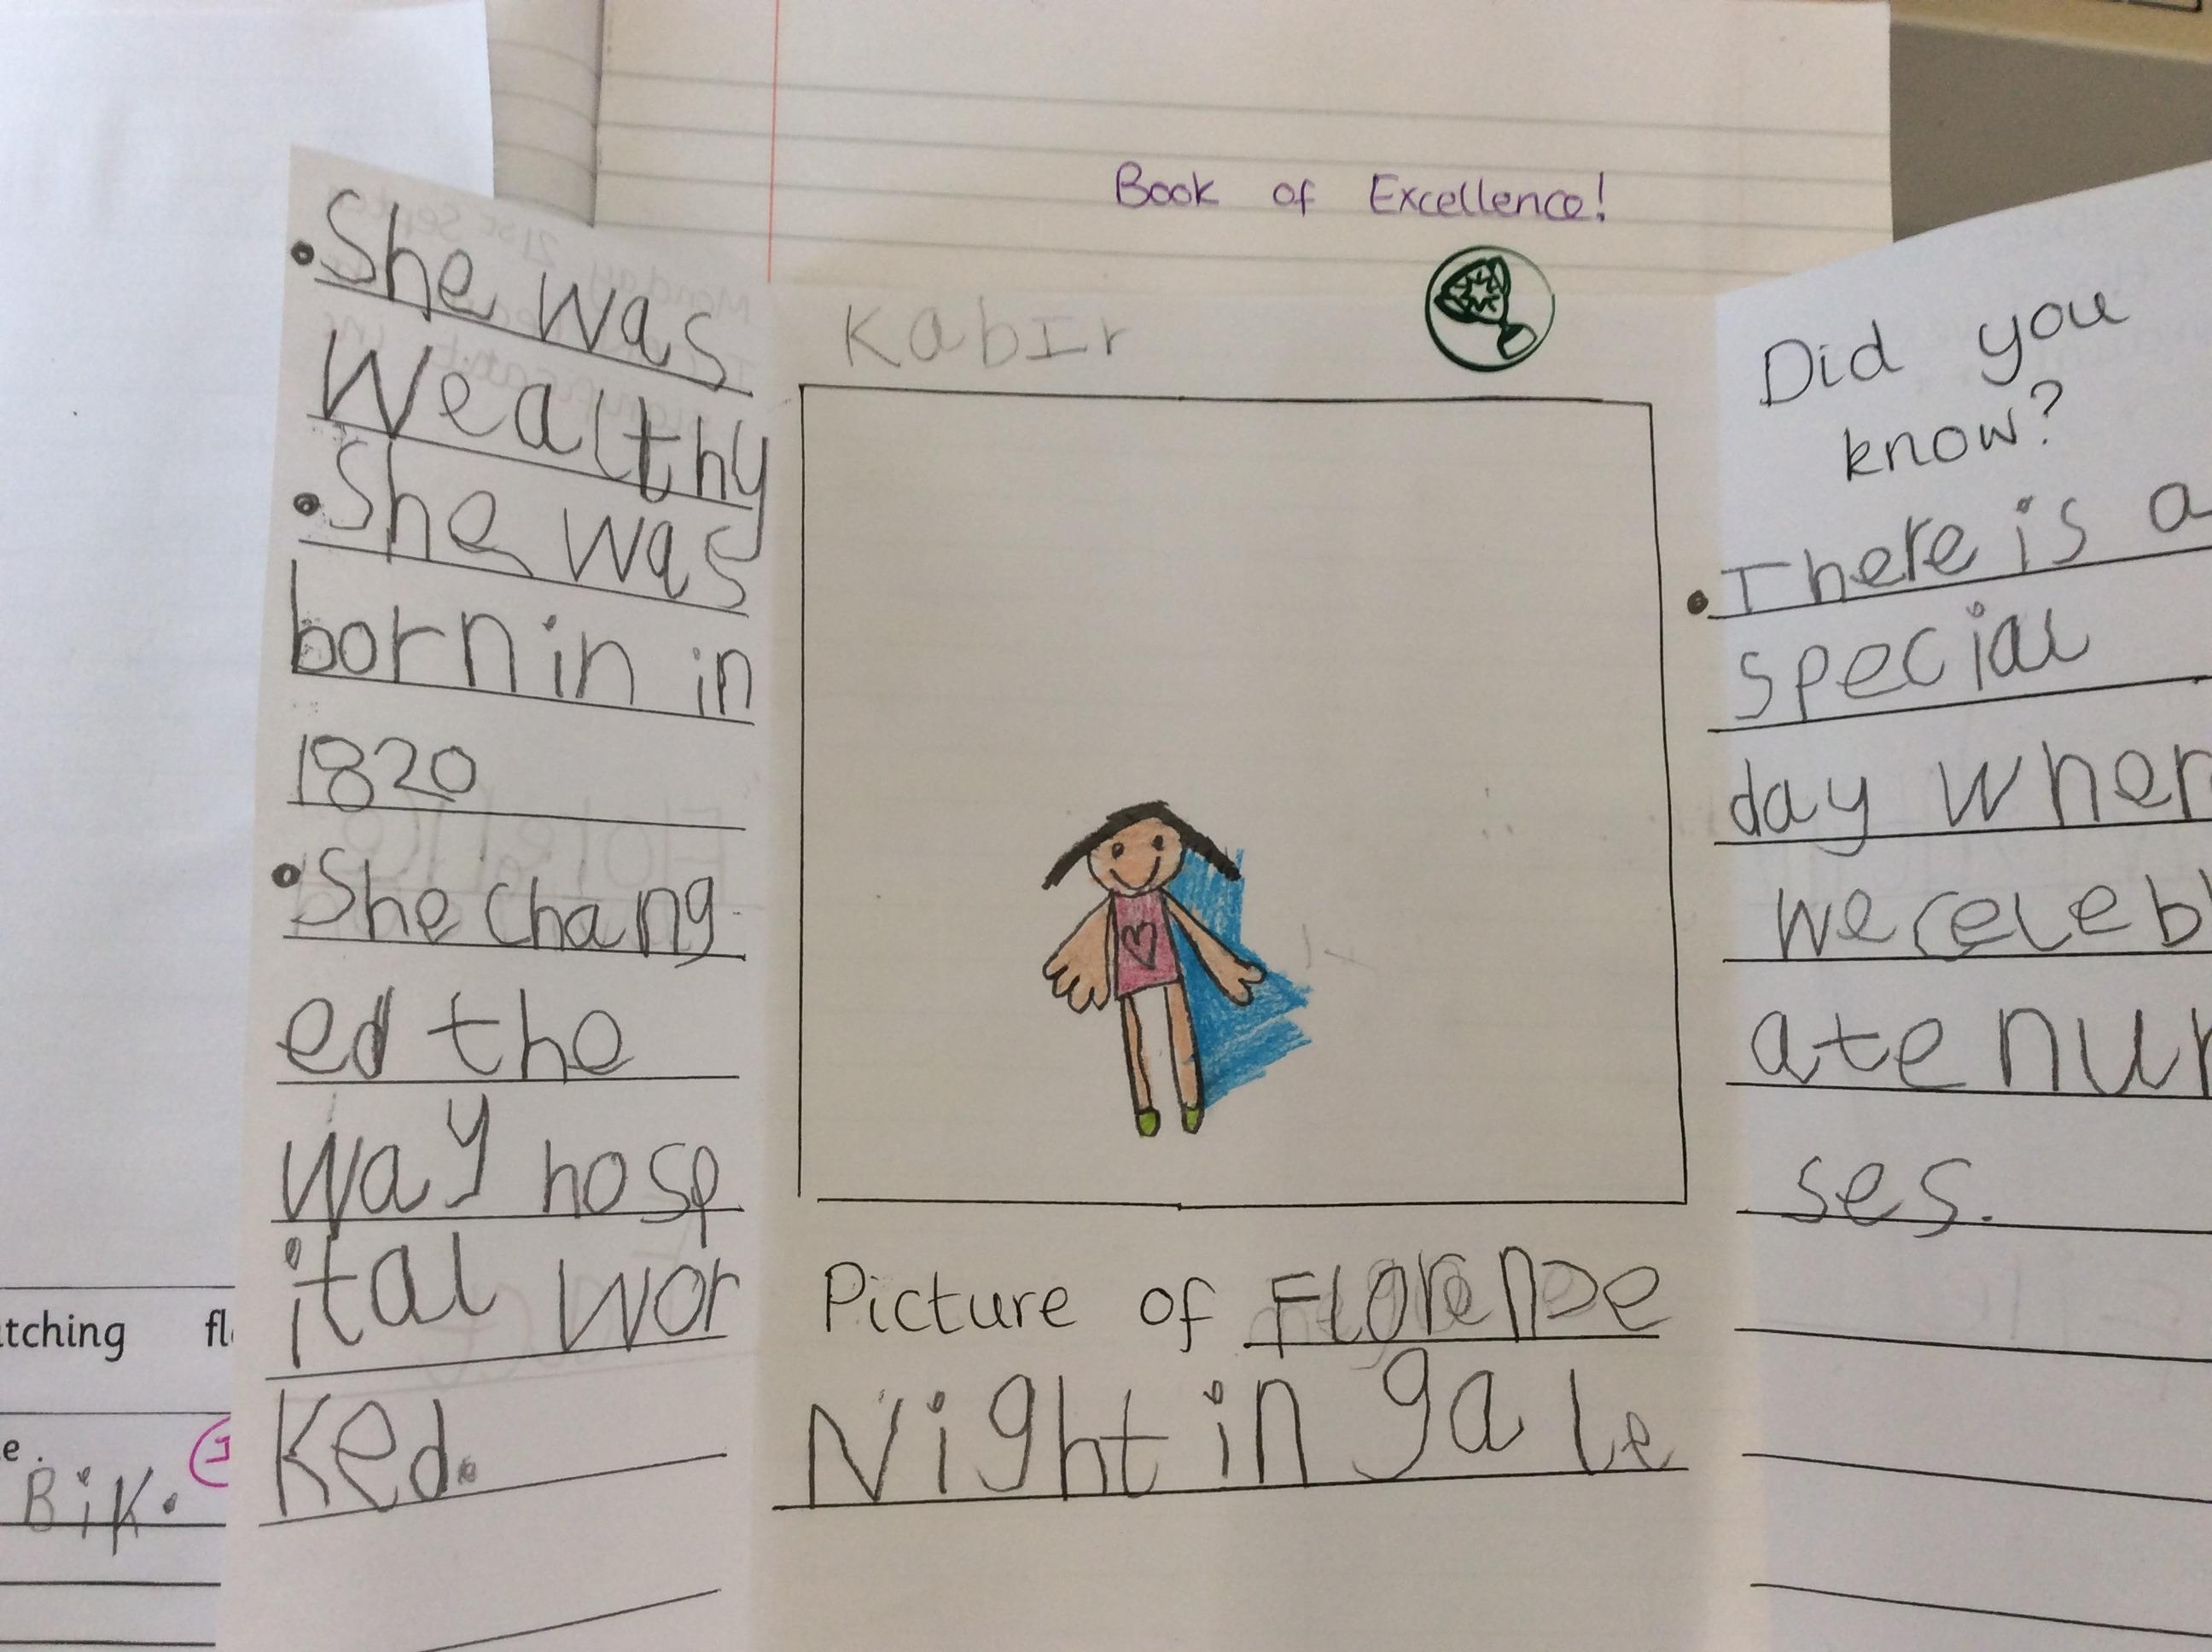 Kabir's brilliant writing!